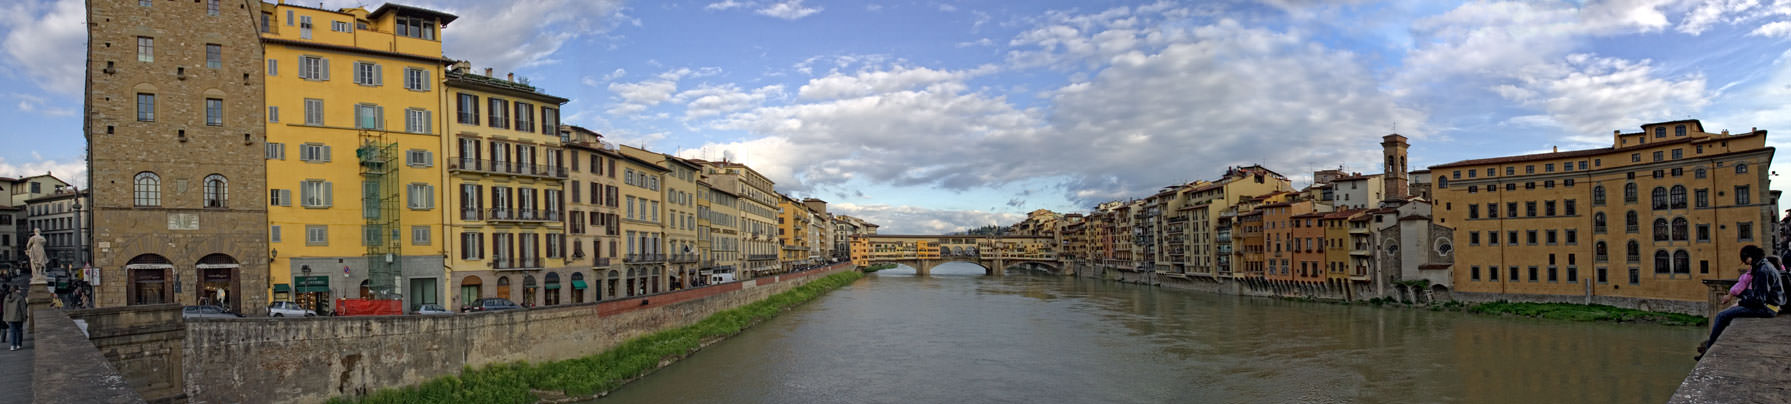 Ponti Vecchio from Ponte Santa Trunita